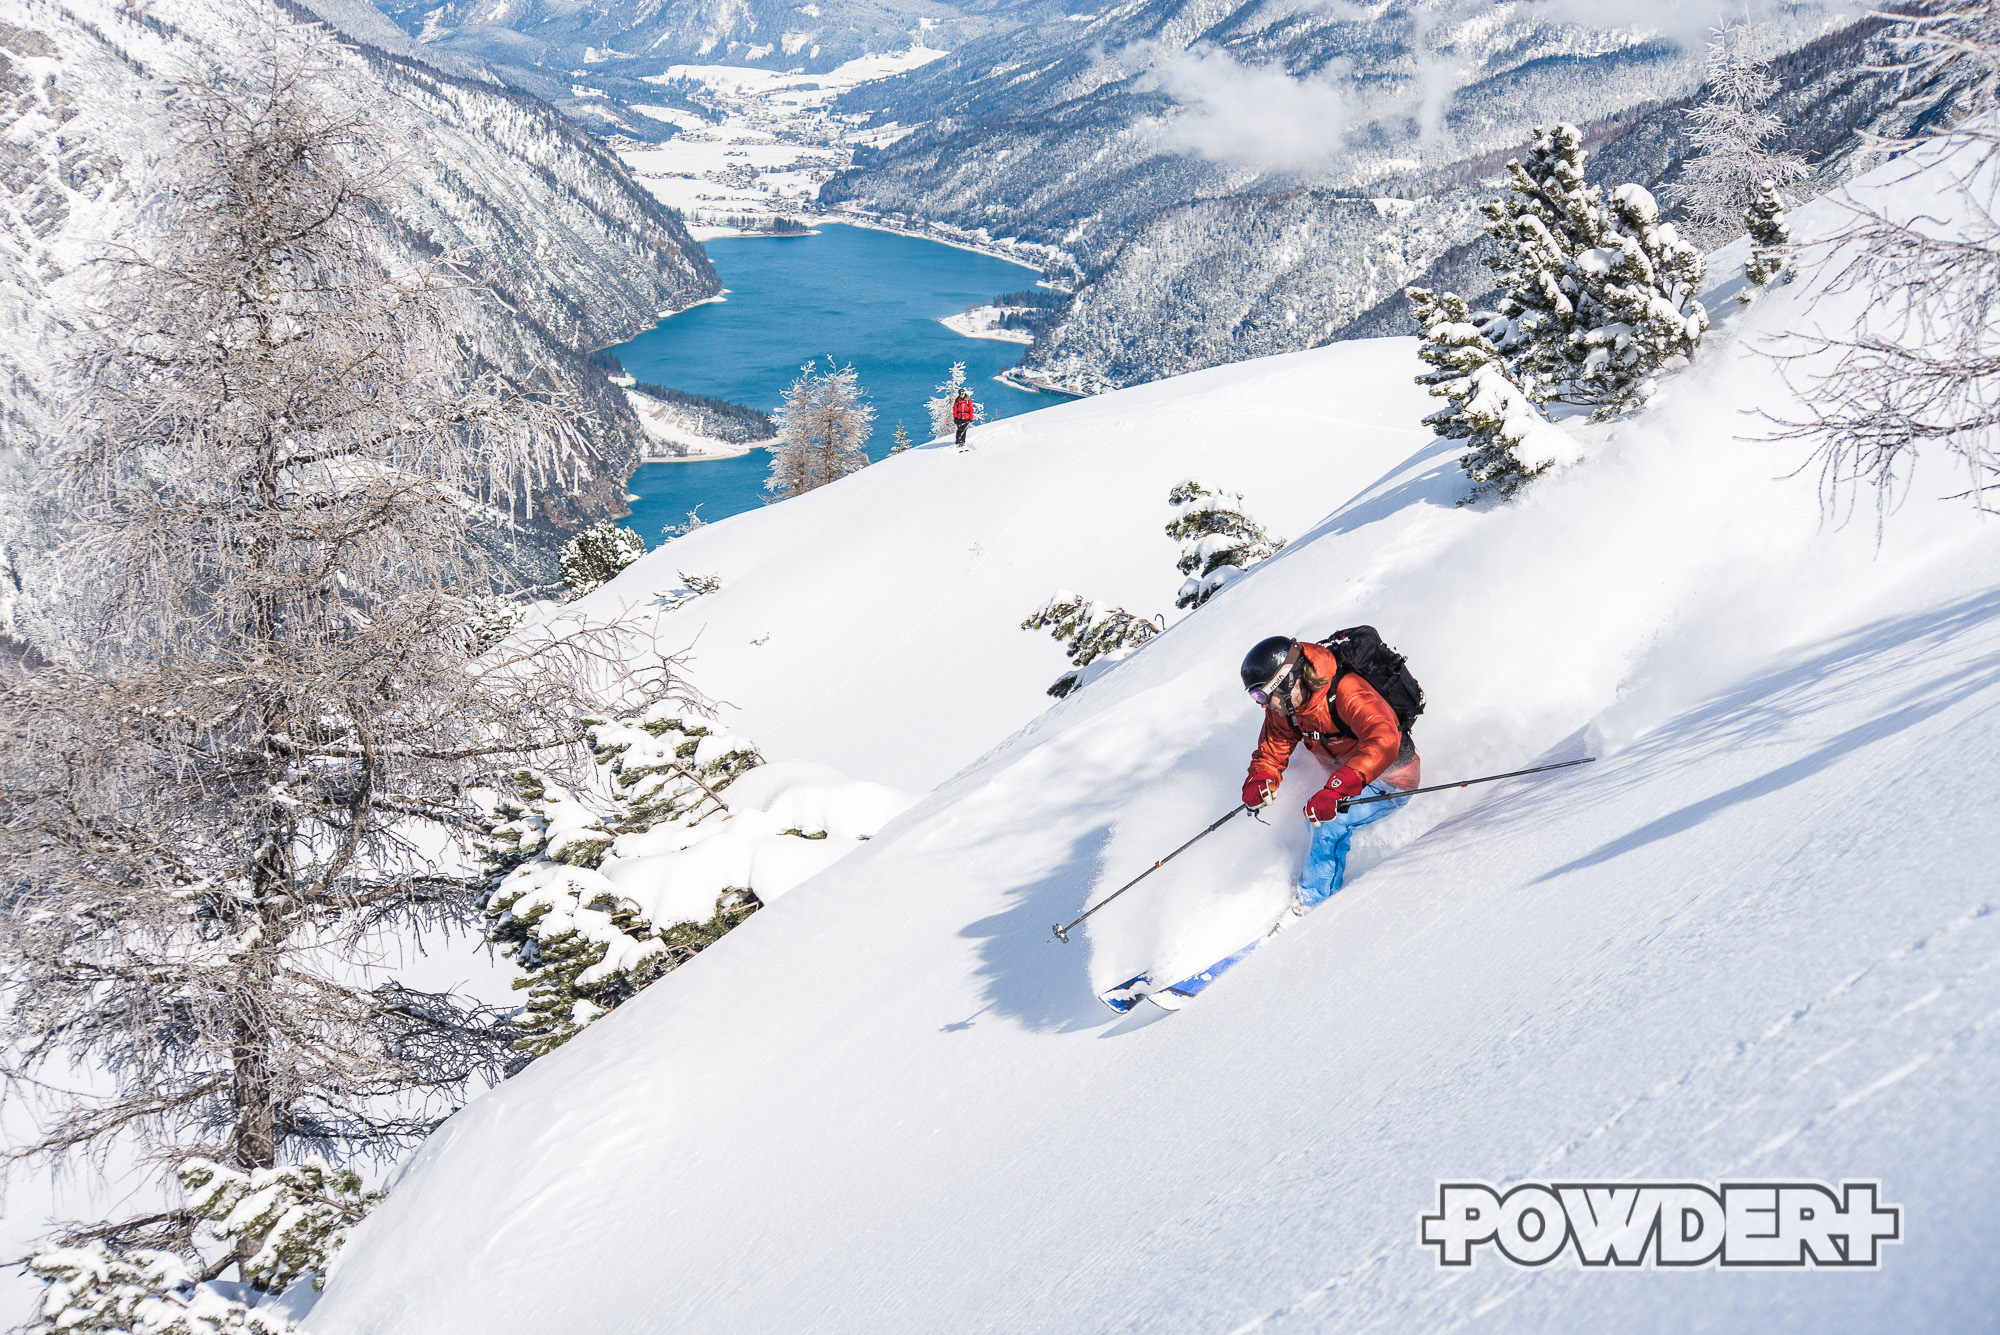 Bärenkopf, Powder Report, Fototour, Achensee, Freeride, freeride-tour, pertisau, tirol, skitour,